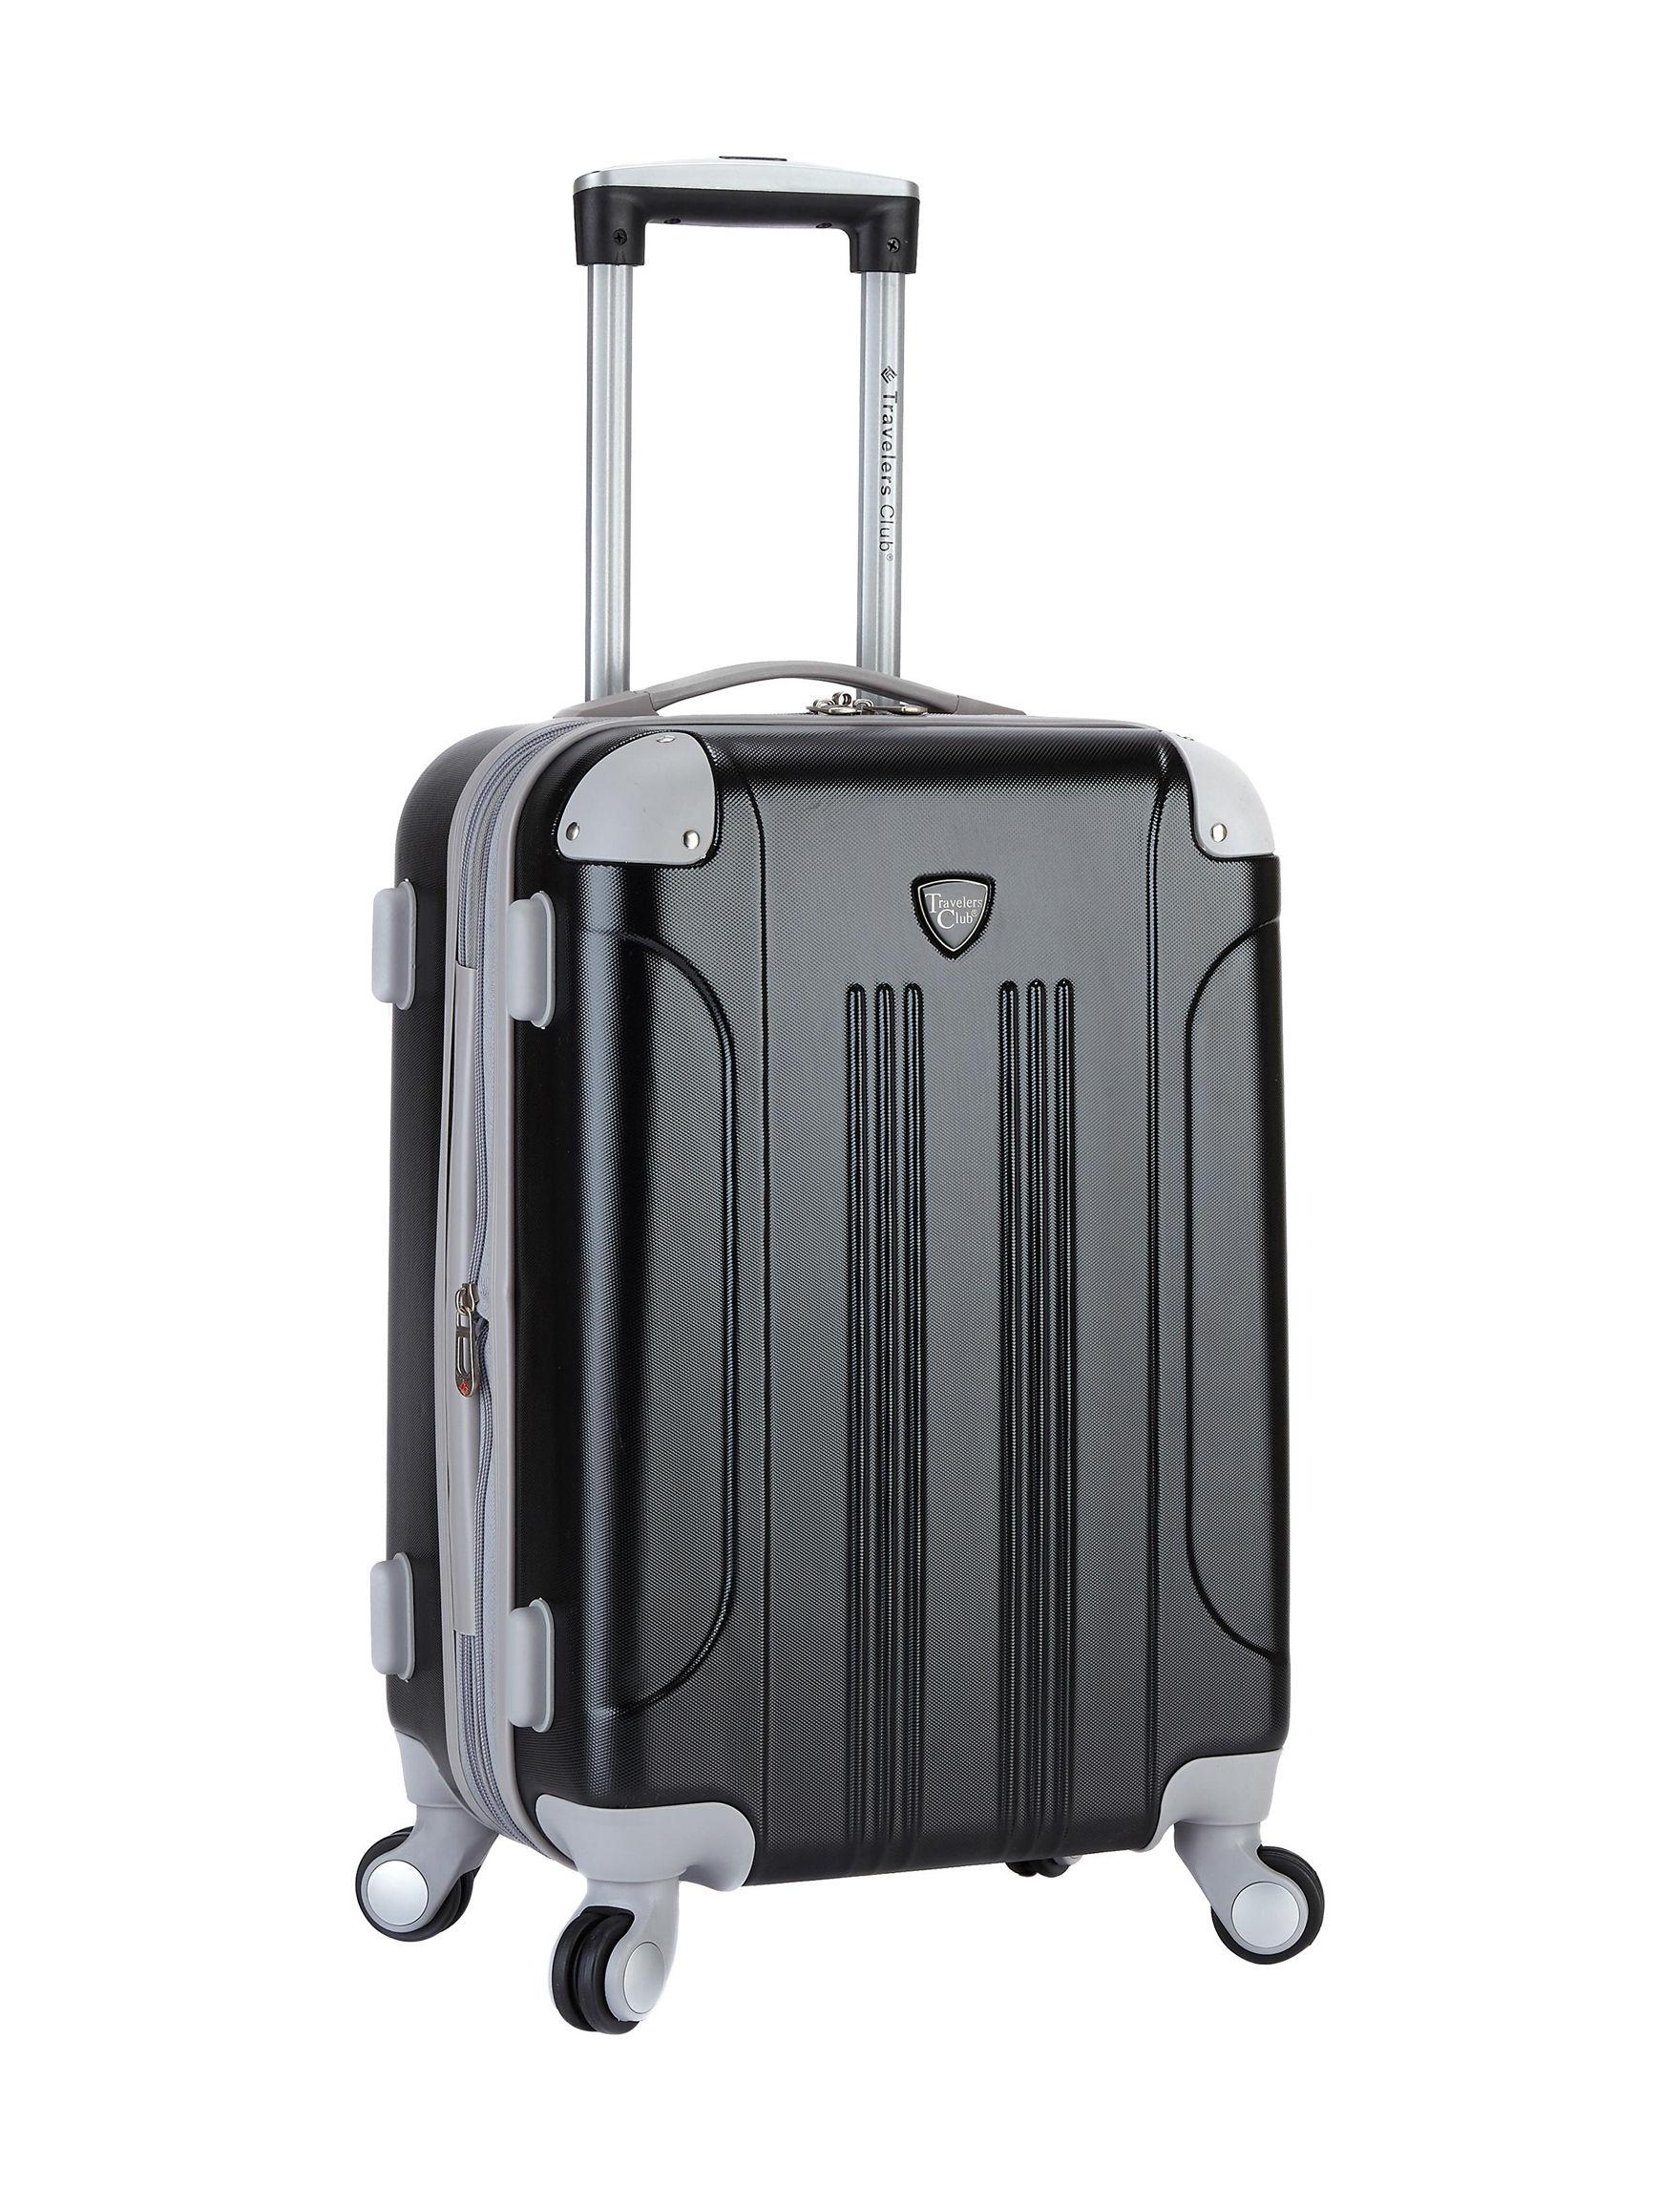 Travelers Club Luggage Black Hardside Upright Spinners